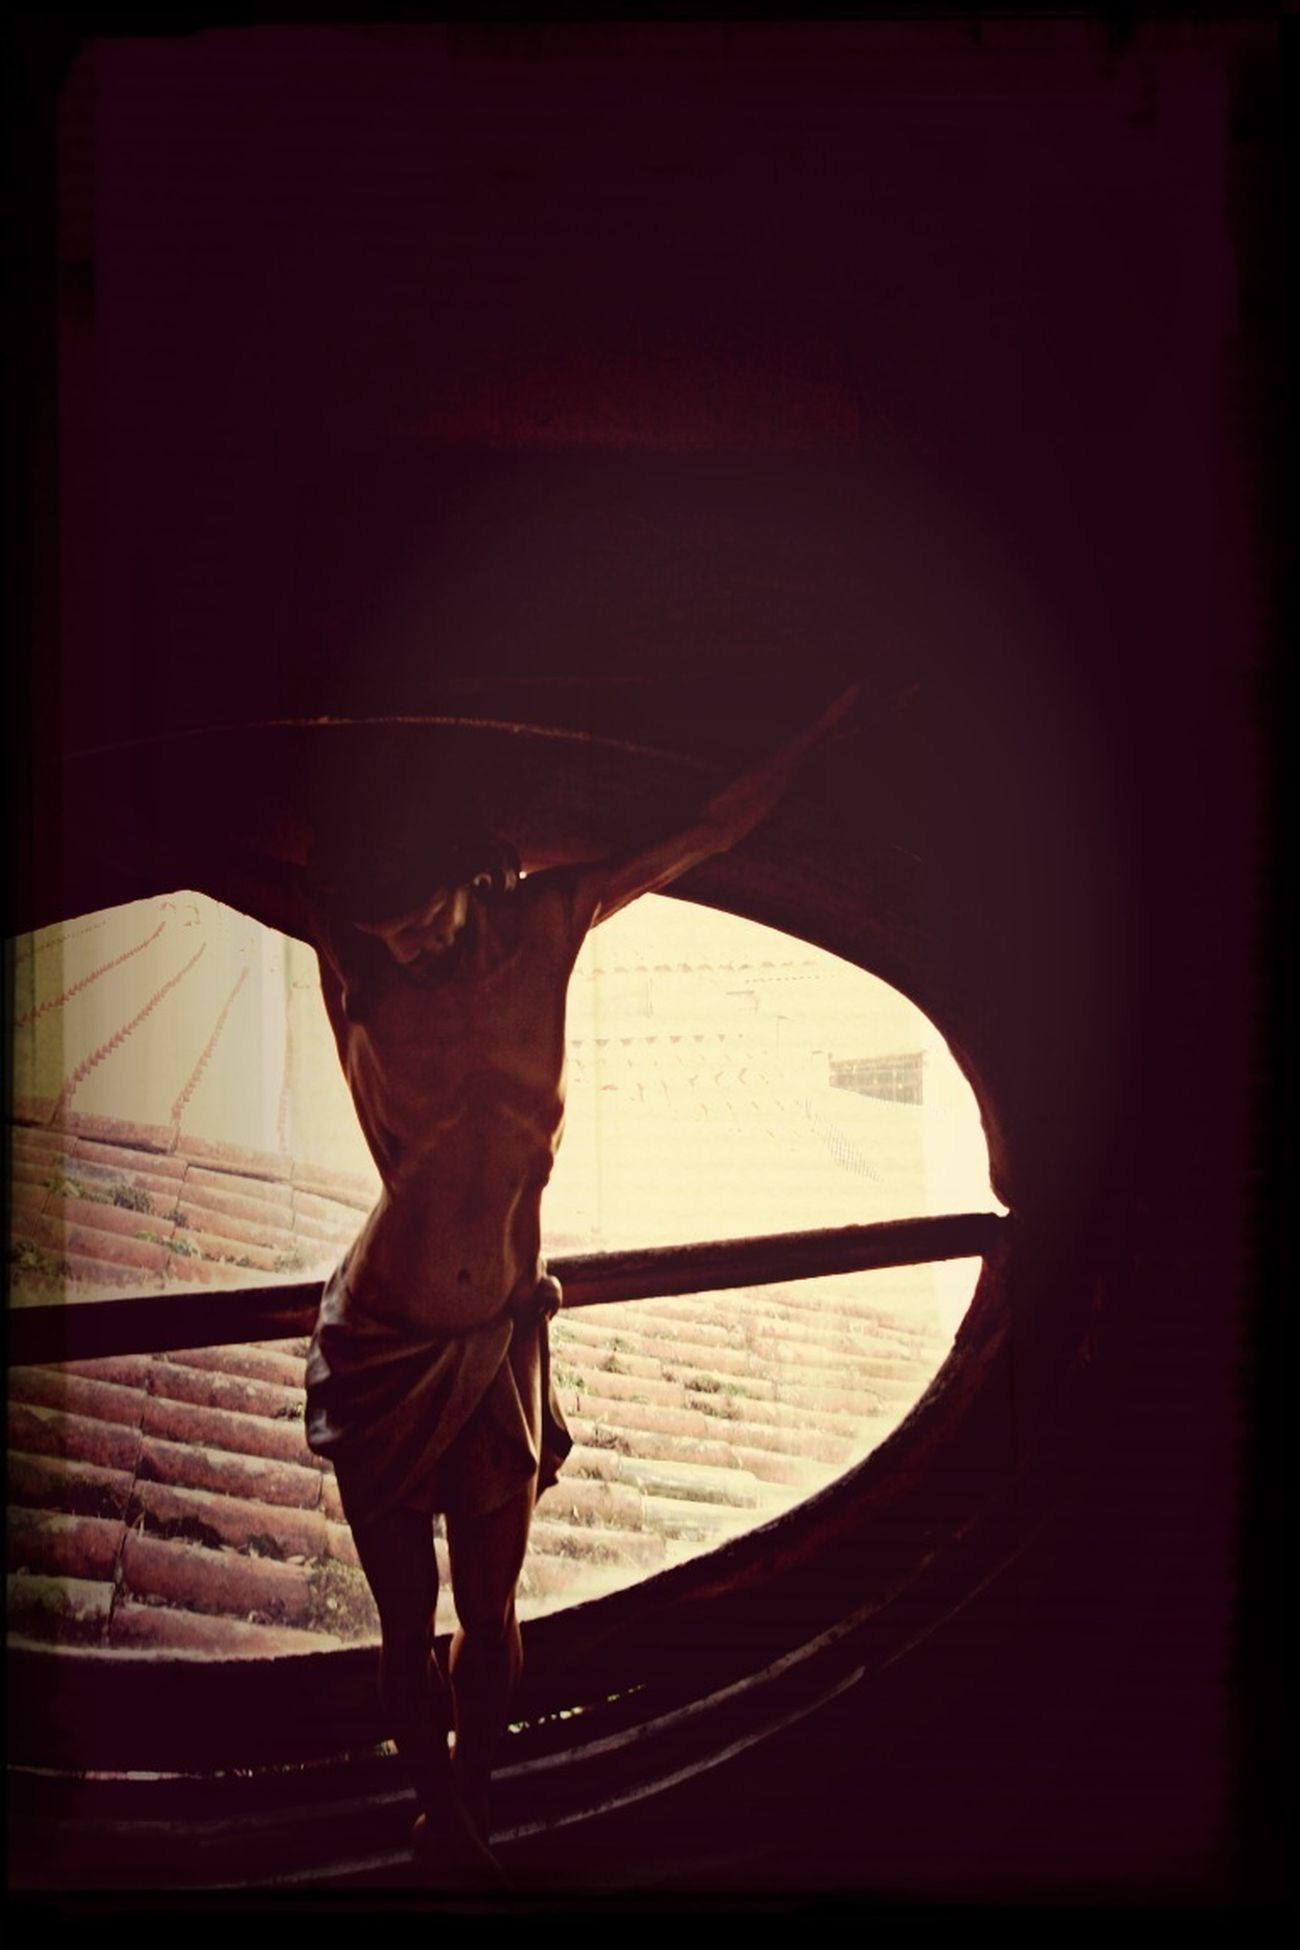 Cristo na janela